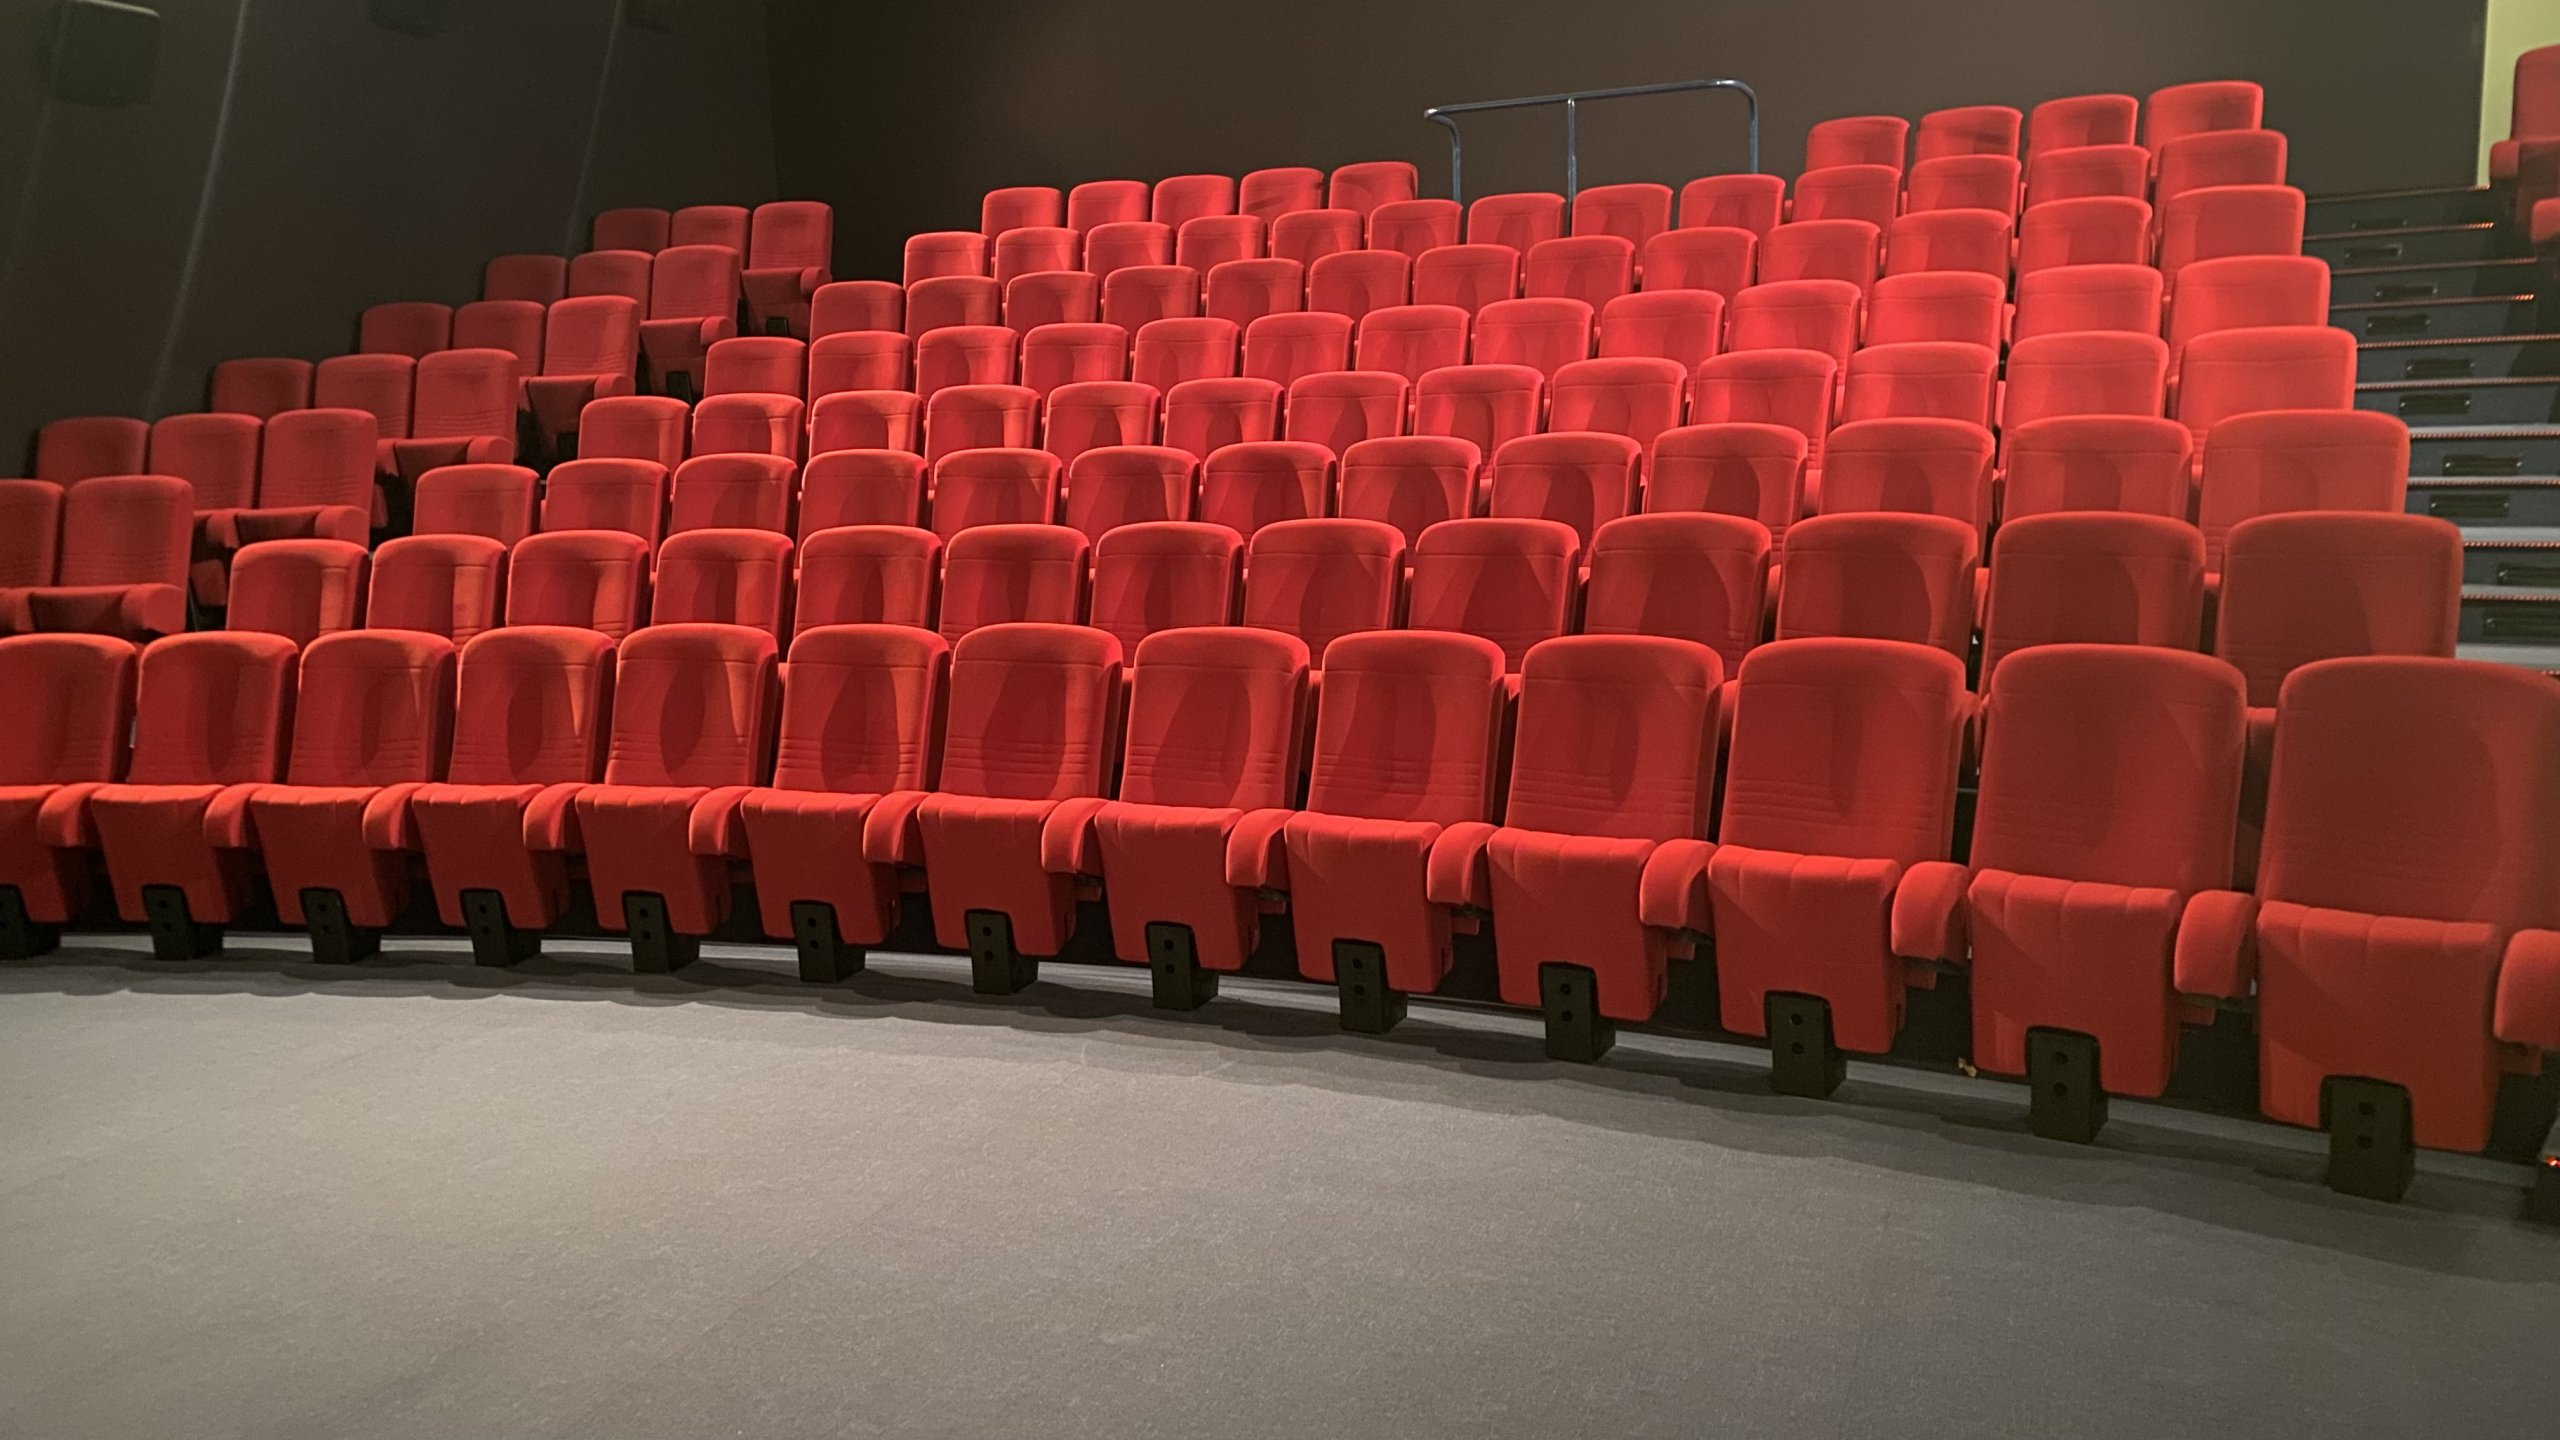 Kleslo - Puto- Leader de fabrication de fauteuils cinéma, théâtre ... cinema admosphere oyonnax v5